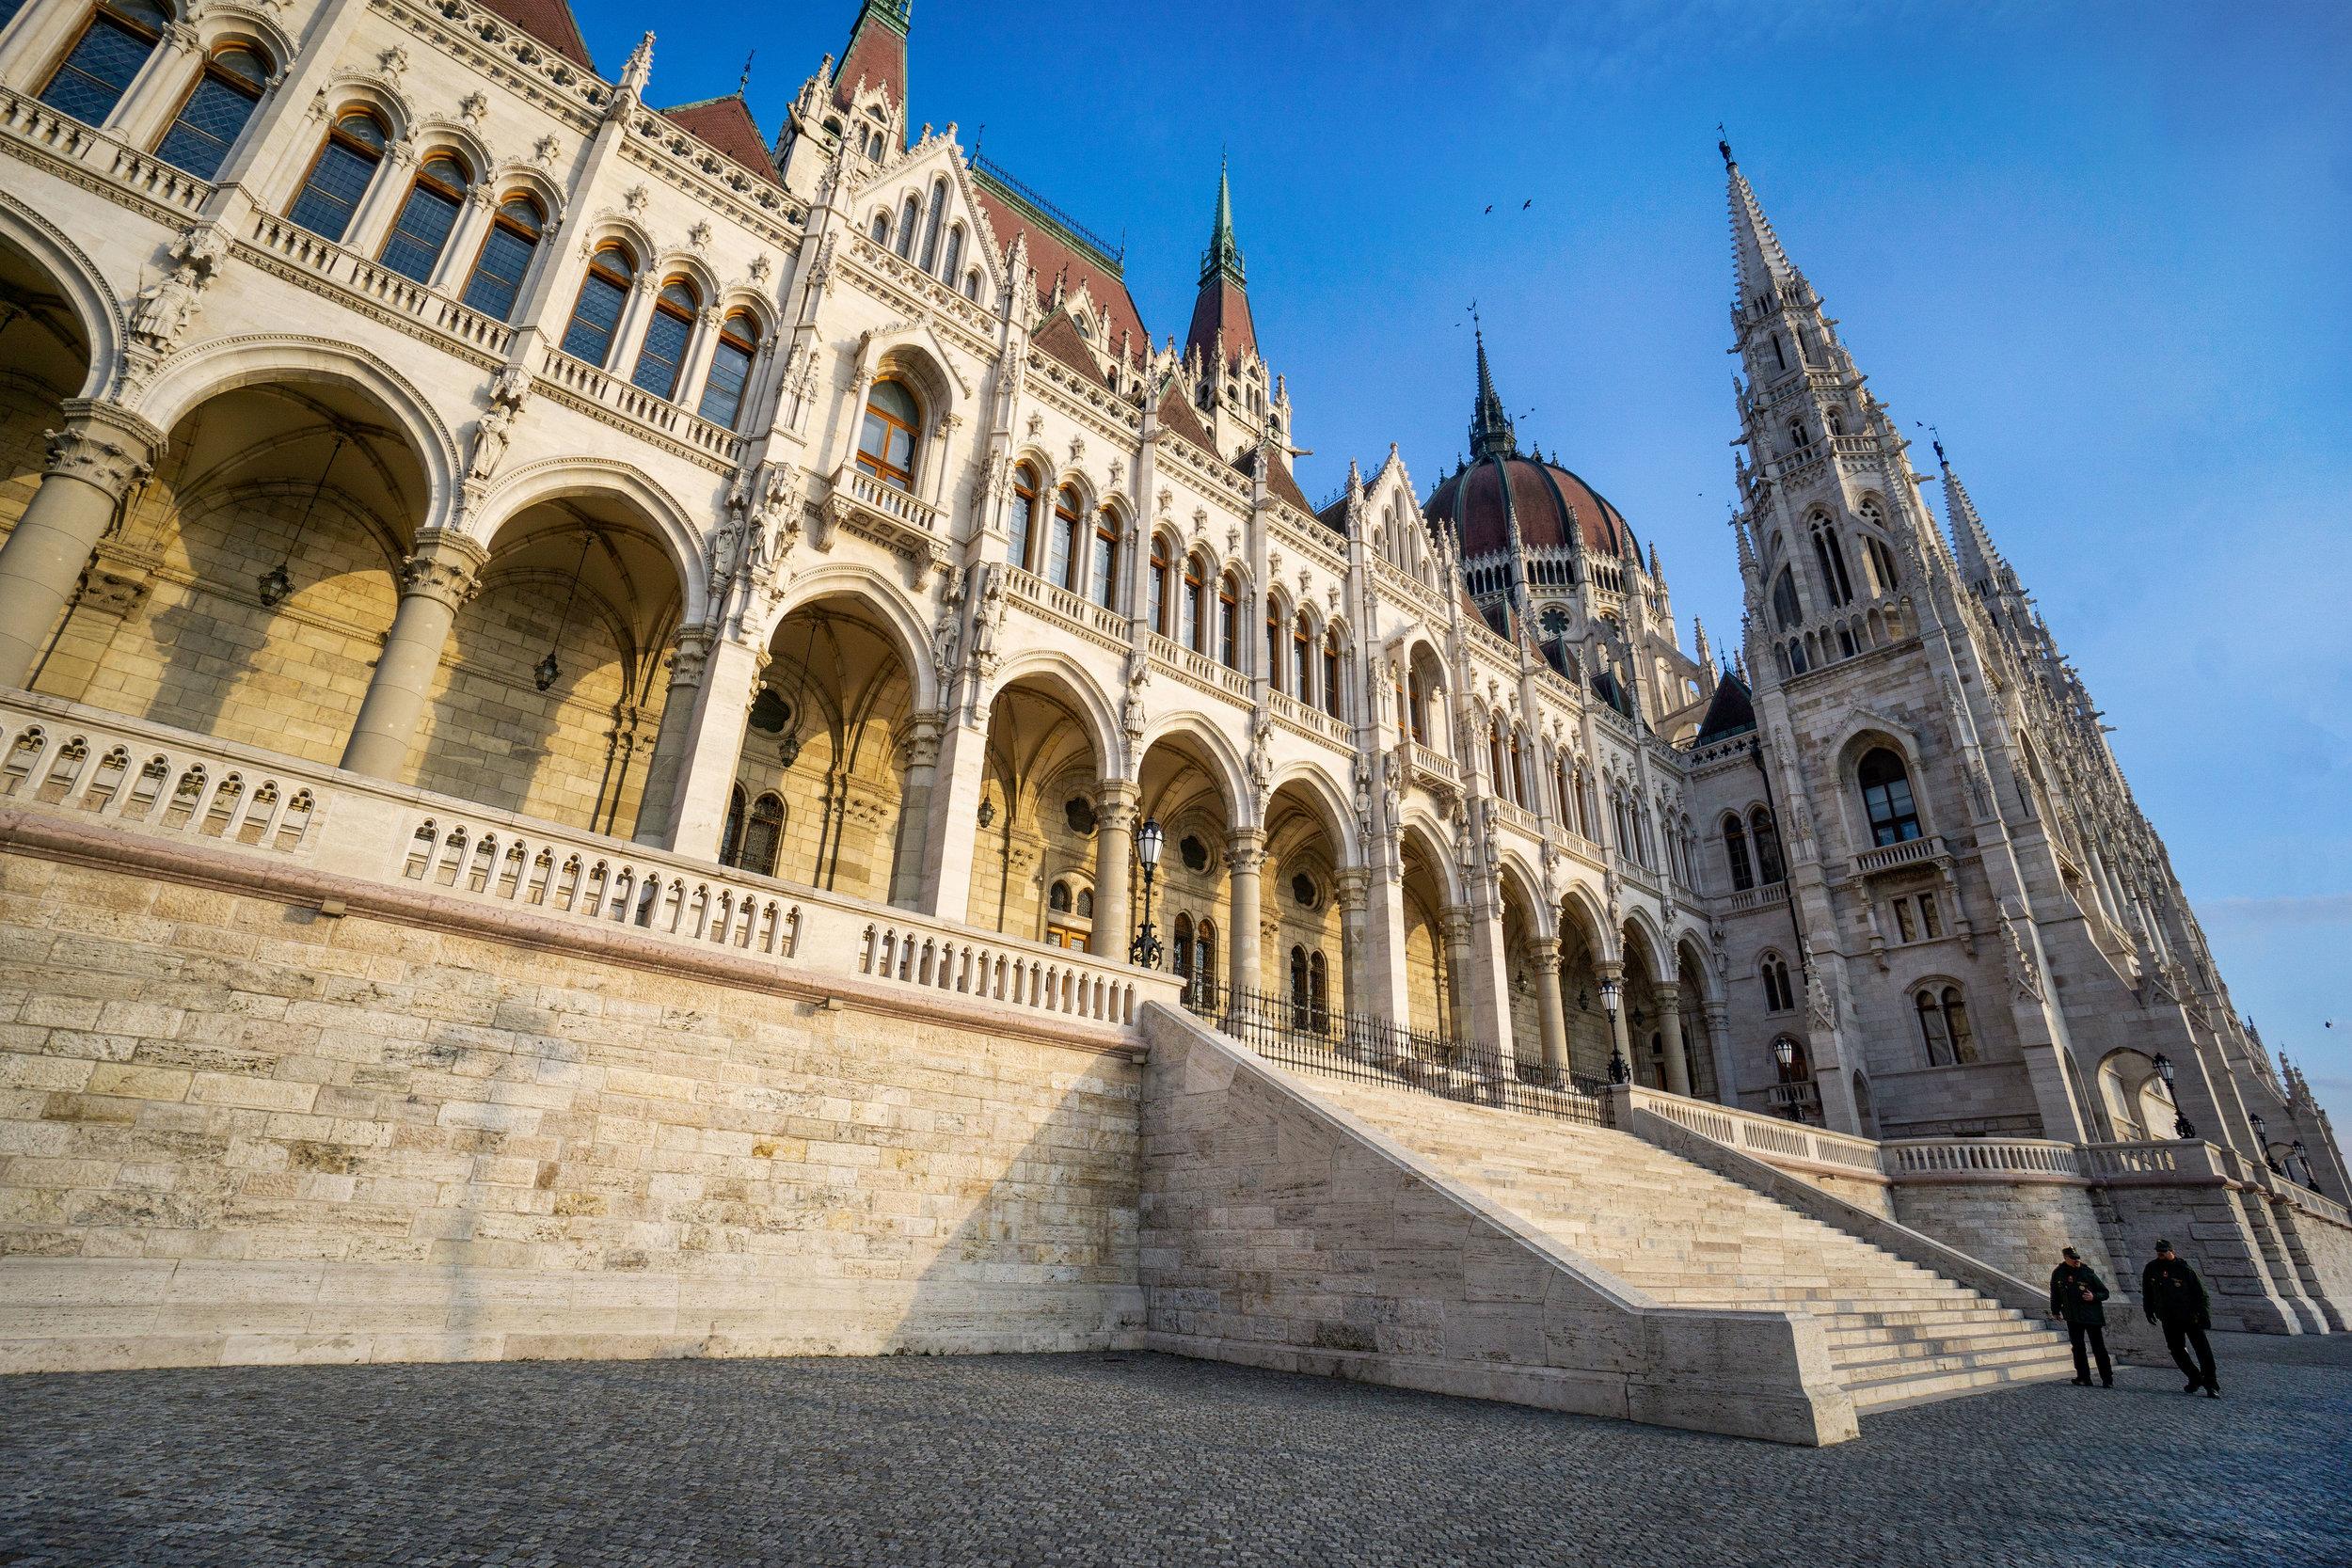 budapest_parliament_building_vickygood_travel_photography4sm.jpg